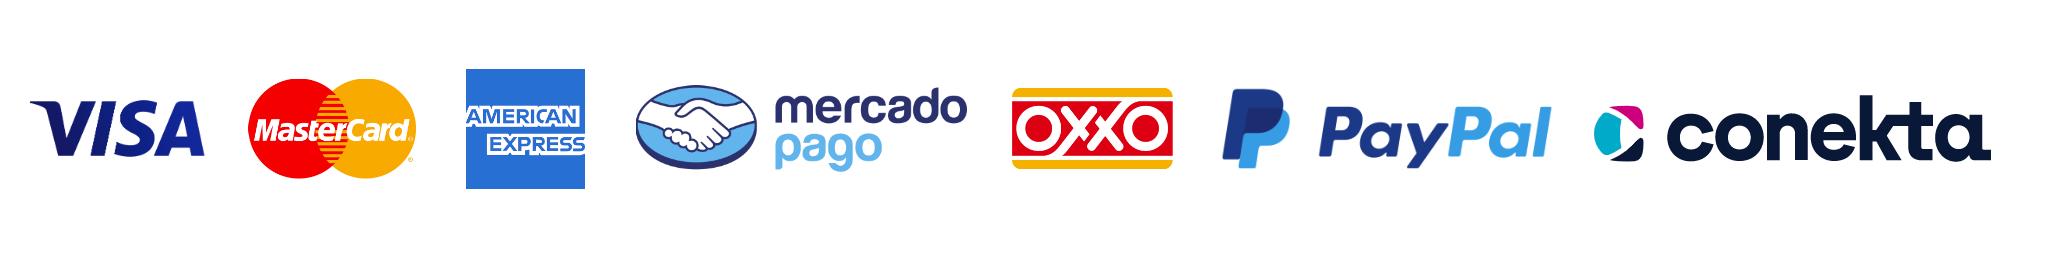 pagos-mastercard-visa-paypal-conekta